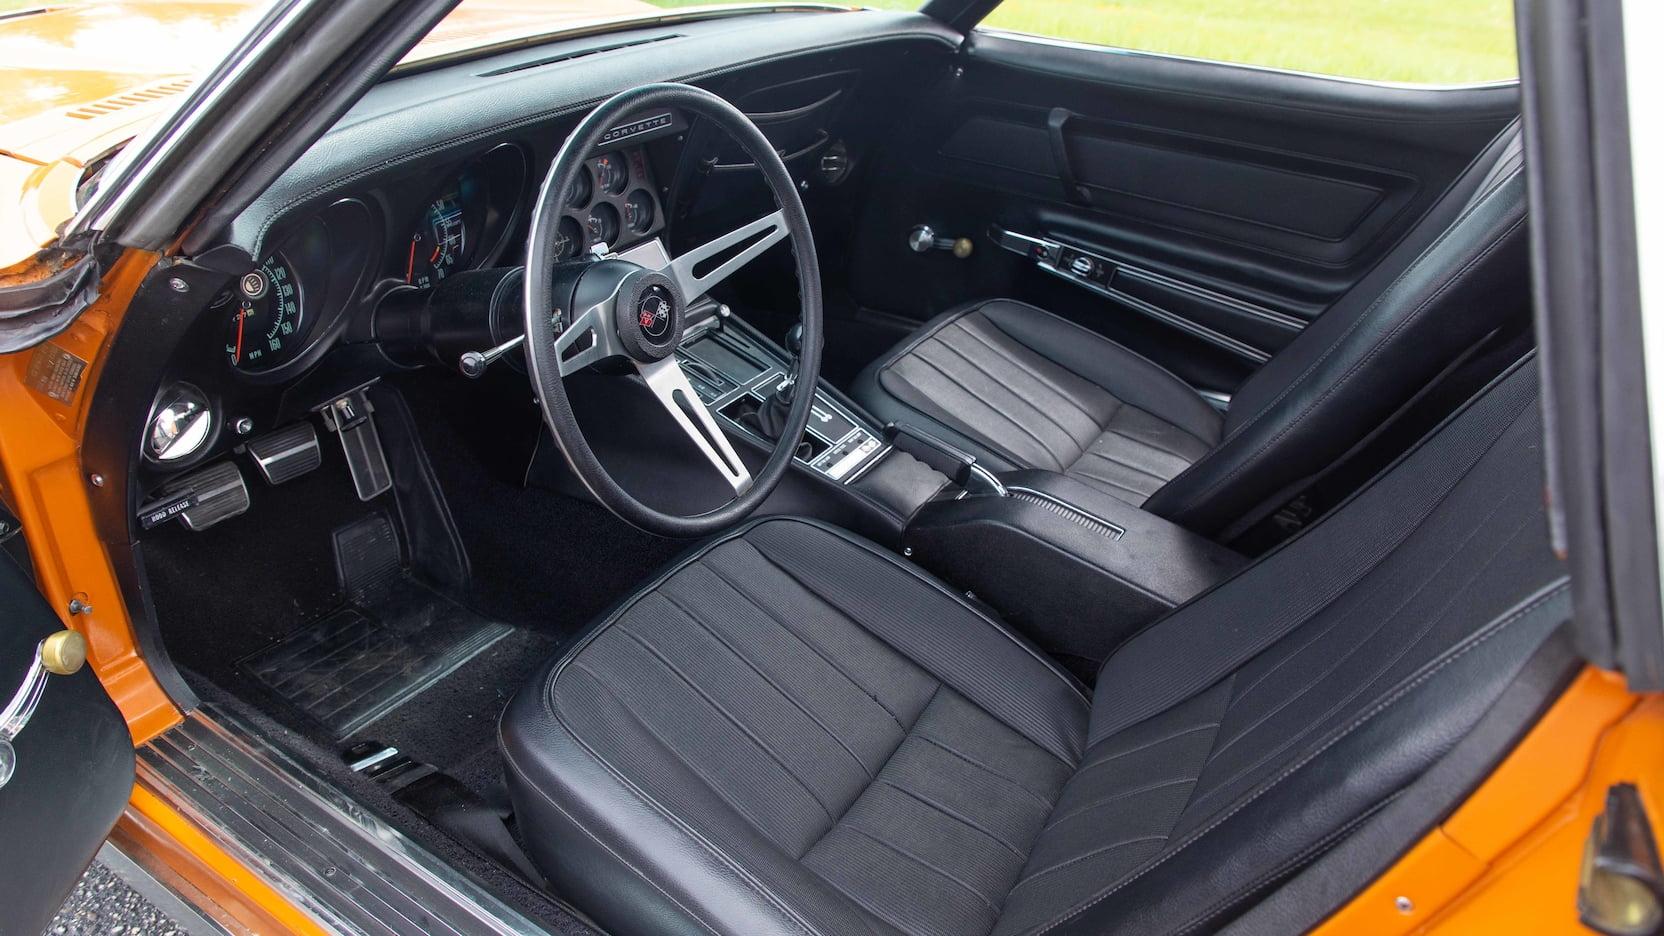 1971 Chevrolet Corvette ZR2 interior